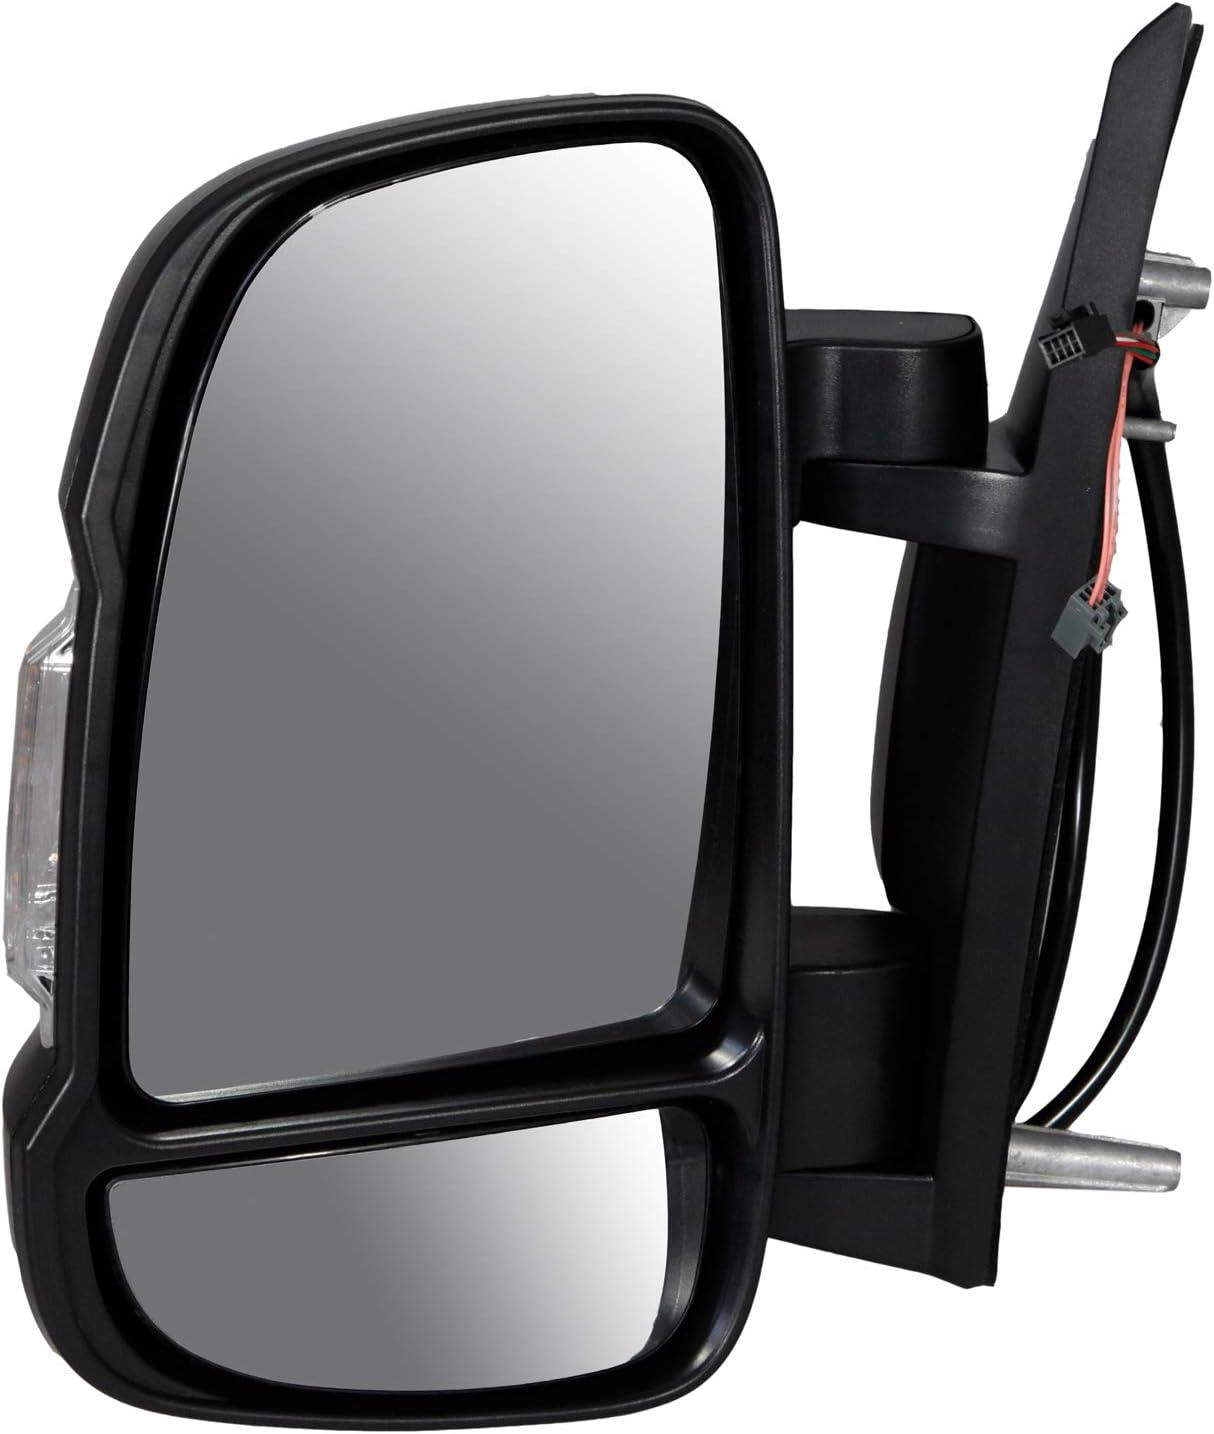 Außenspiegel für CITROEN JUMPER FIAT DUCATO PEUGEOT BOXER links 735620699